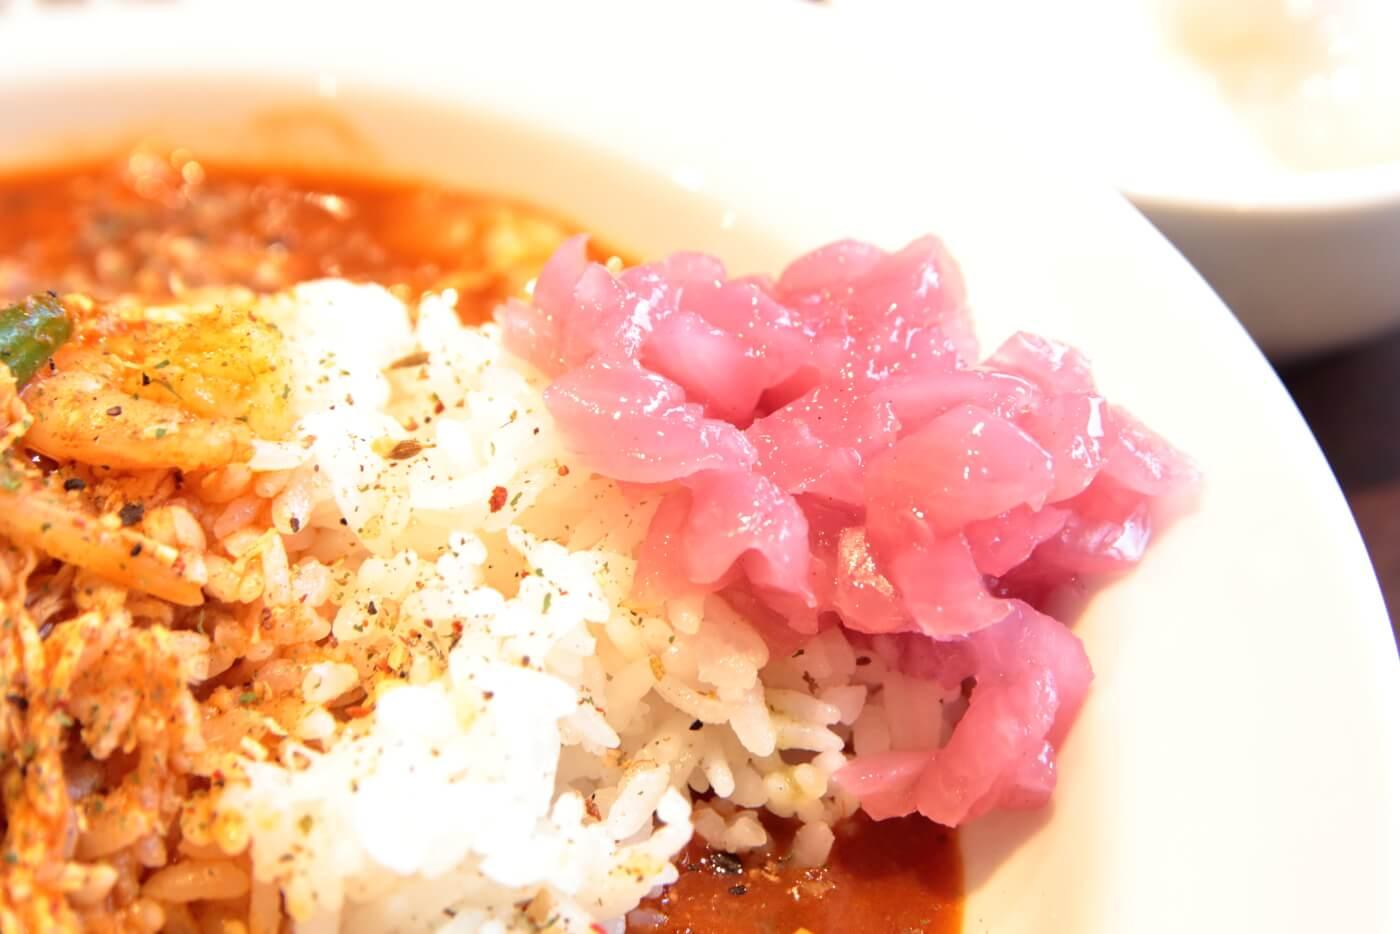 CoCo壱番屋(ココイチ)スパイスカレー THE Asia